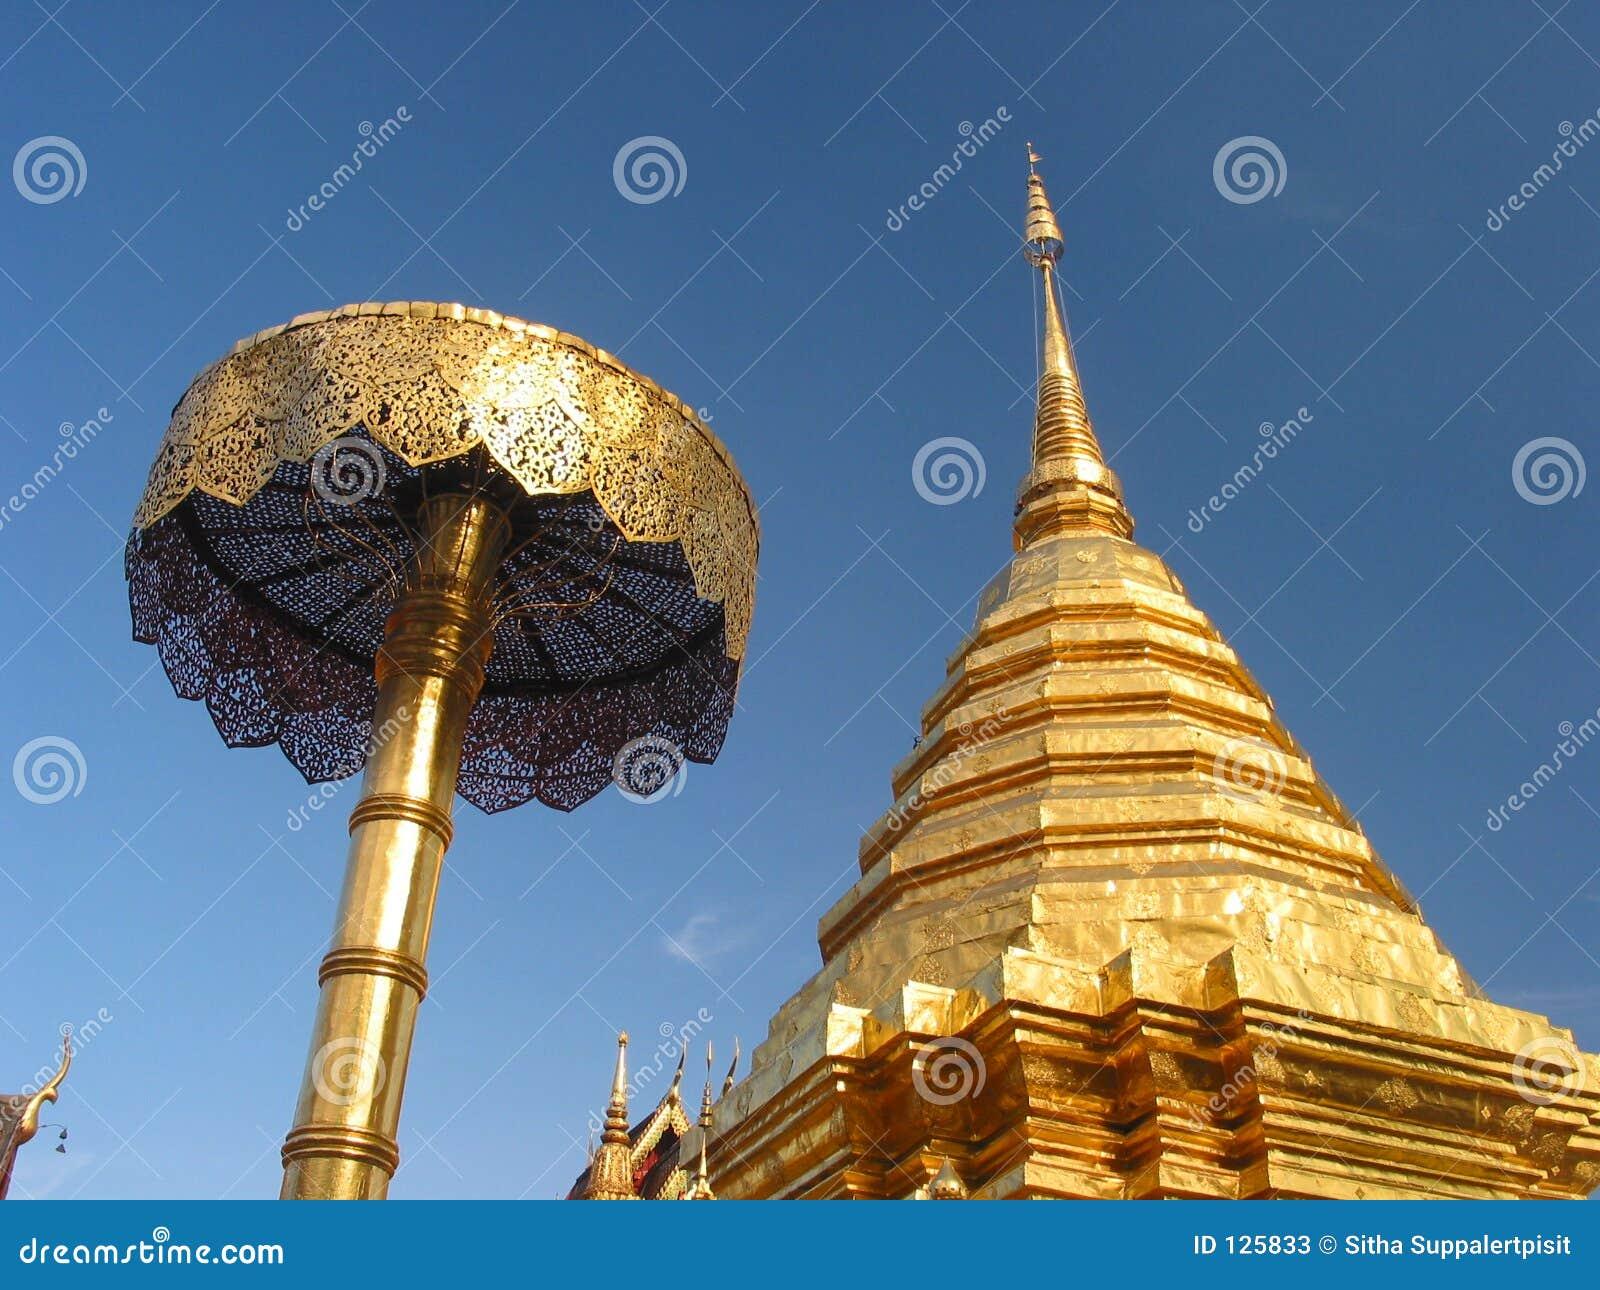 Doi chiang mai phrathat suthep wat Thailand